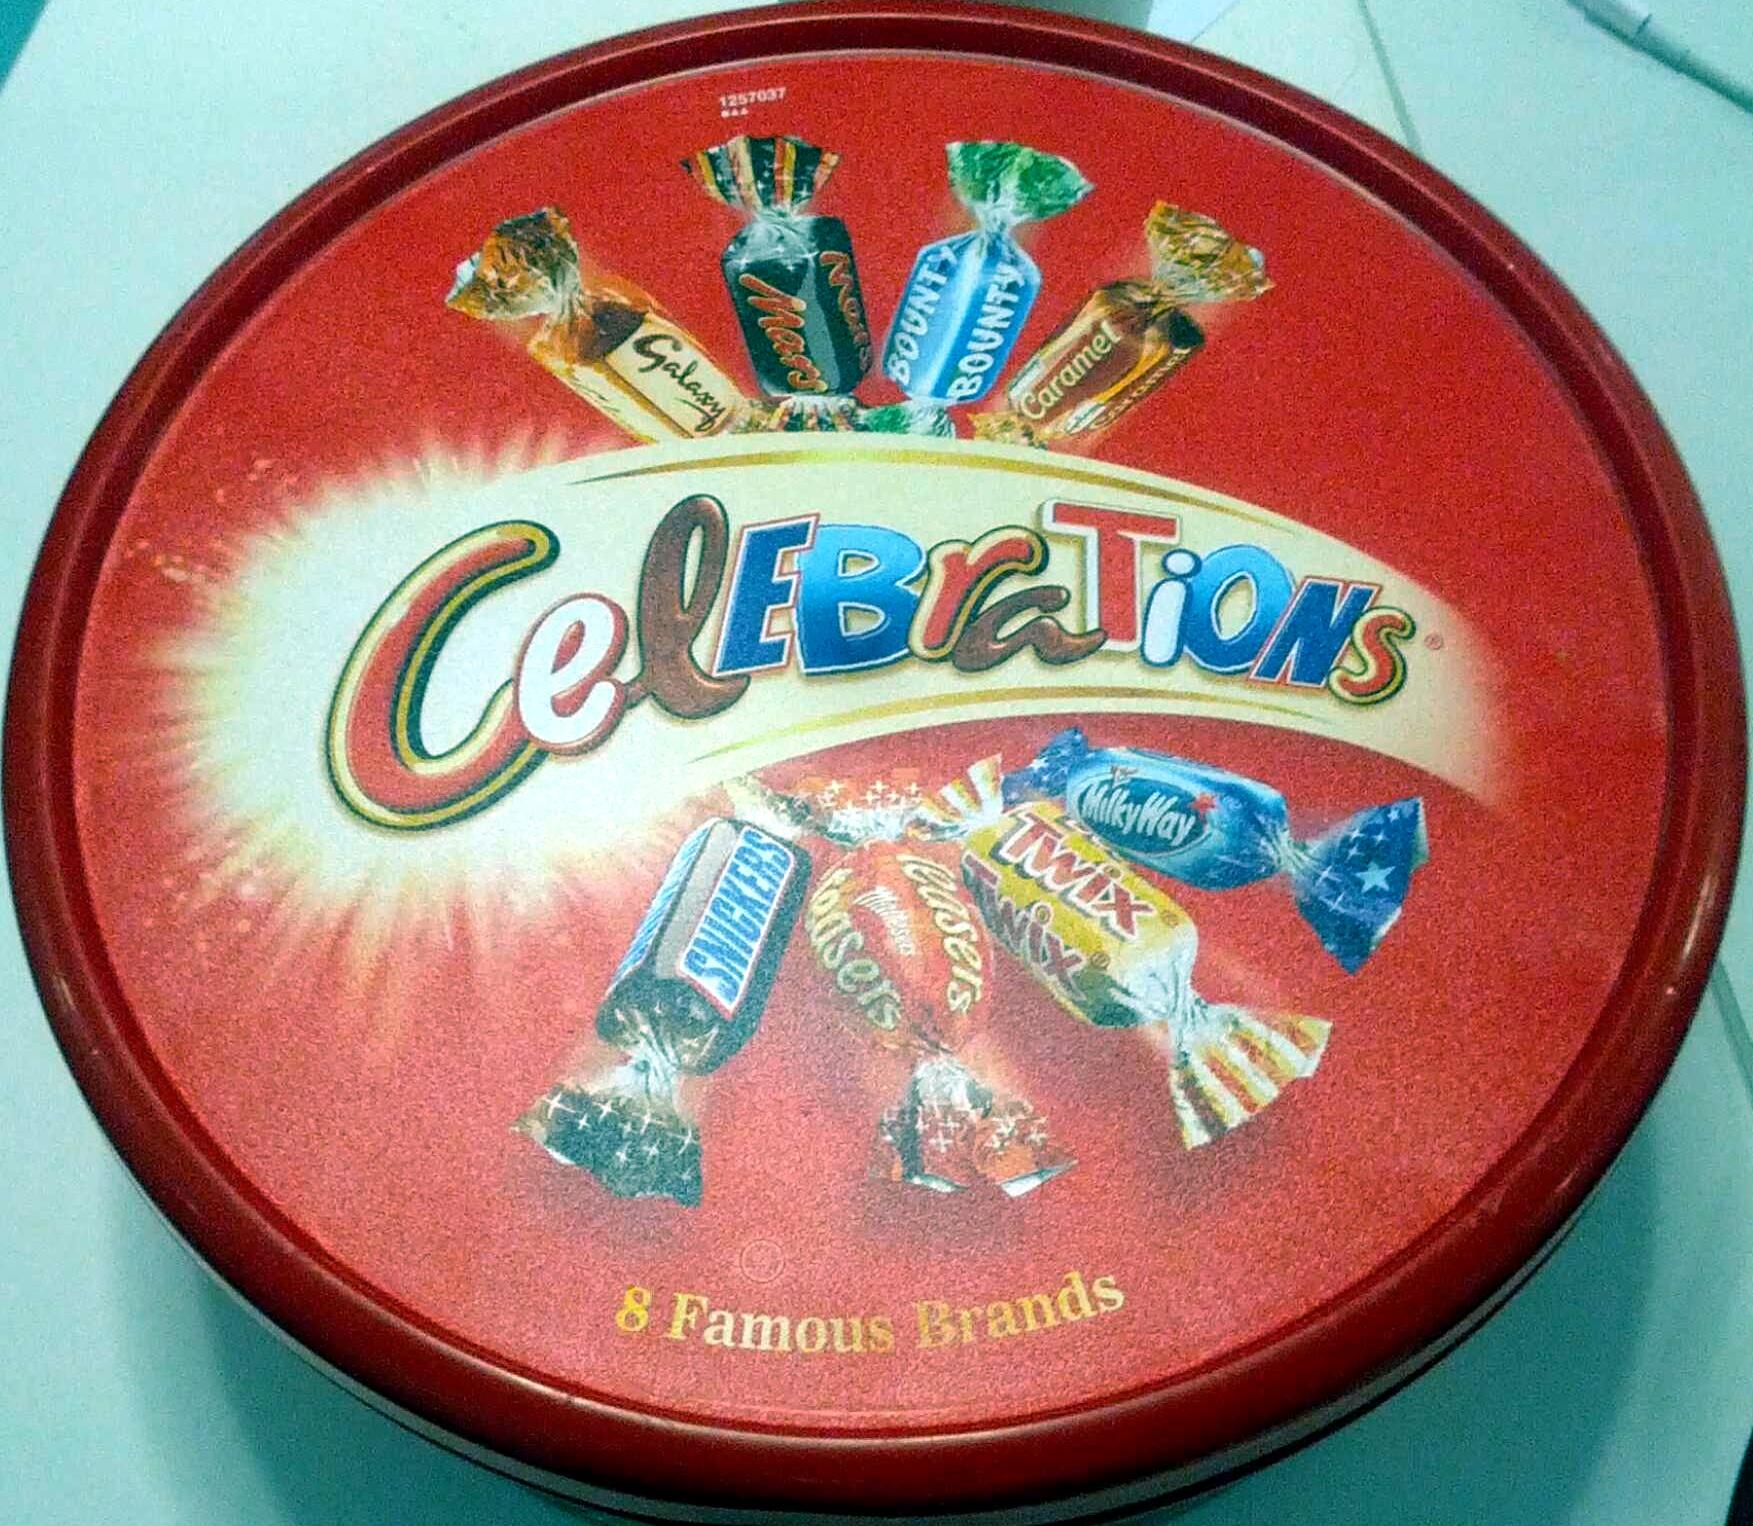 Celebrations - Product - en